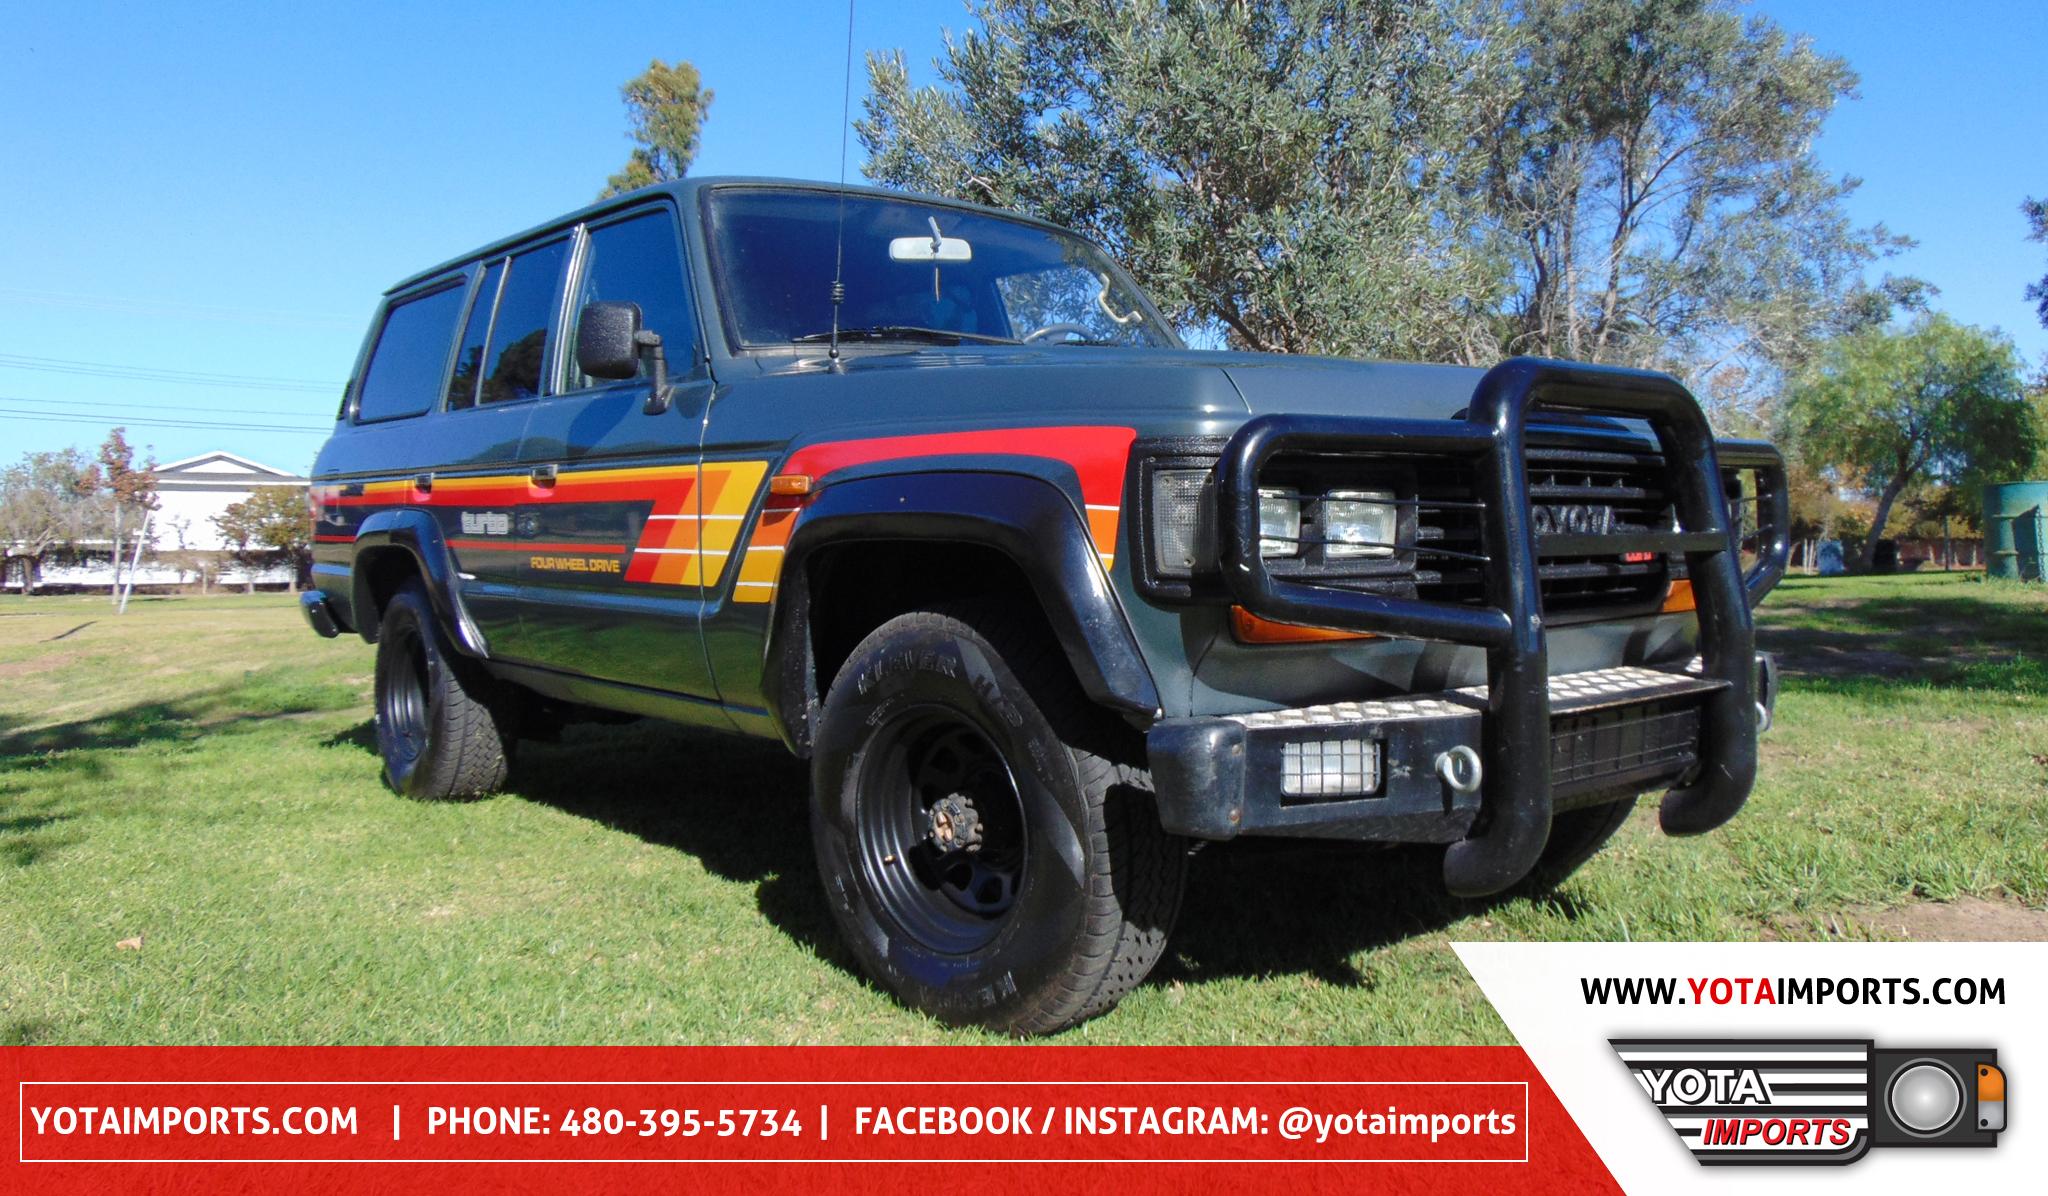 1988 Toyota Land Cruiser U2013 HJ61 #020161201A